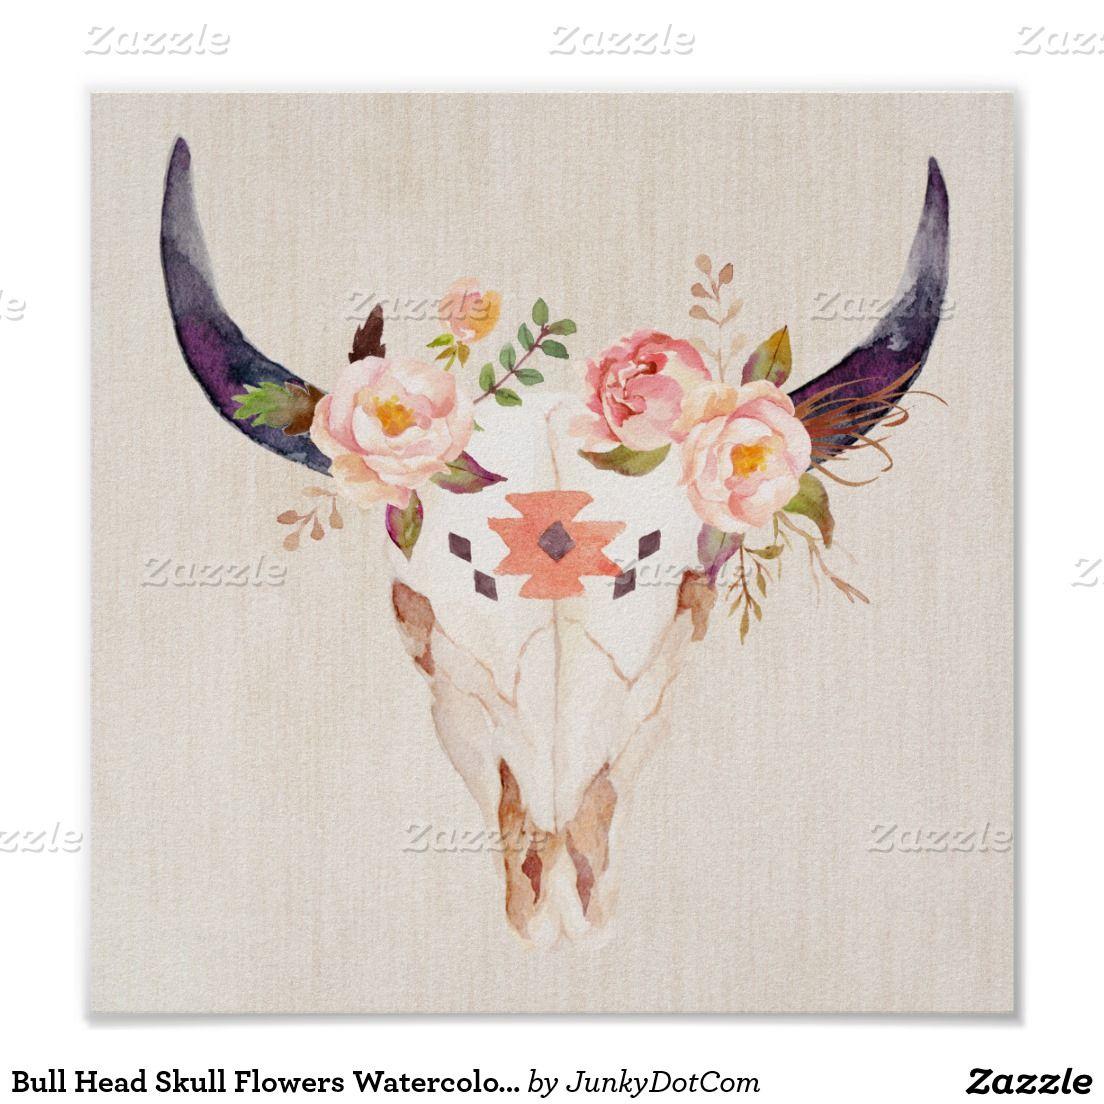 Bull Head Skull Flowers Watercolor Illustration Poster - March 11 #zazzle #junkydotcom